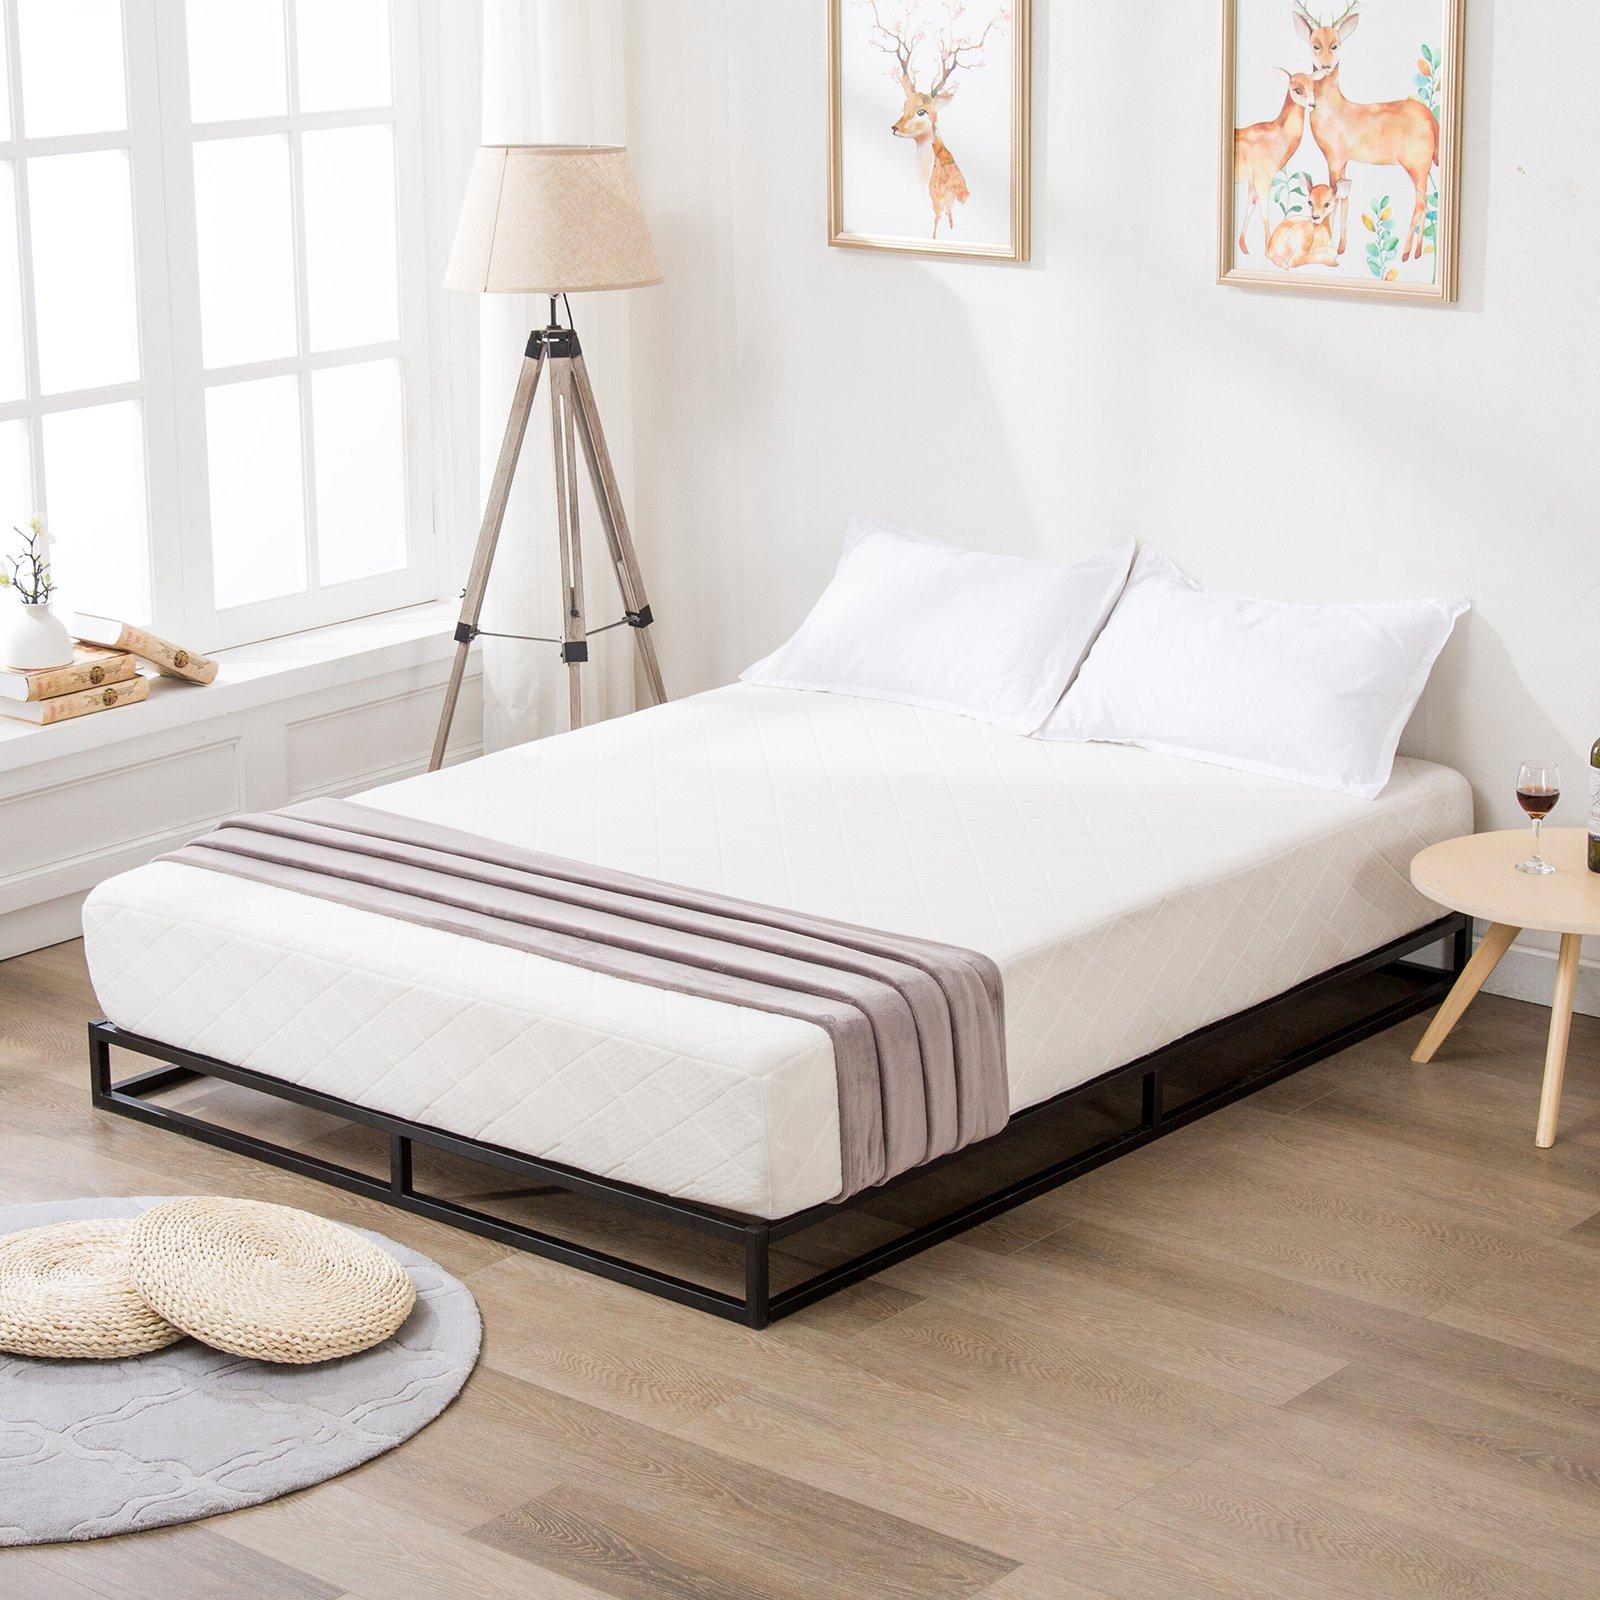 Mecor Modern Studio 6 Inch Reinforced Platforma Low Profile Bed Frame, Mattress Foundation, Boxspring Optional, Wood slat support,Full Size